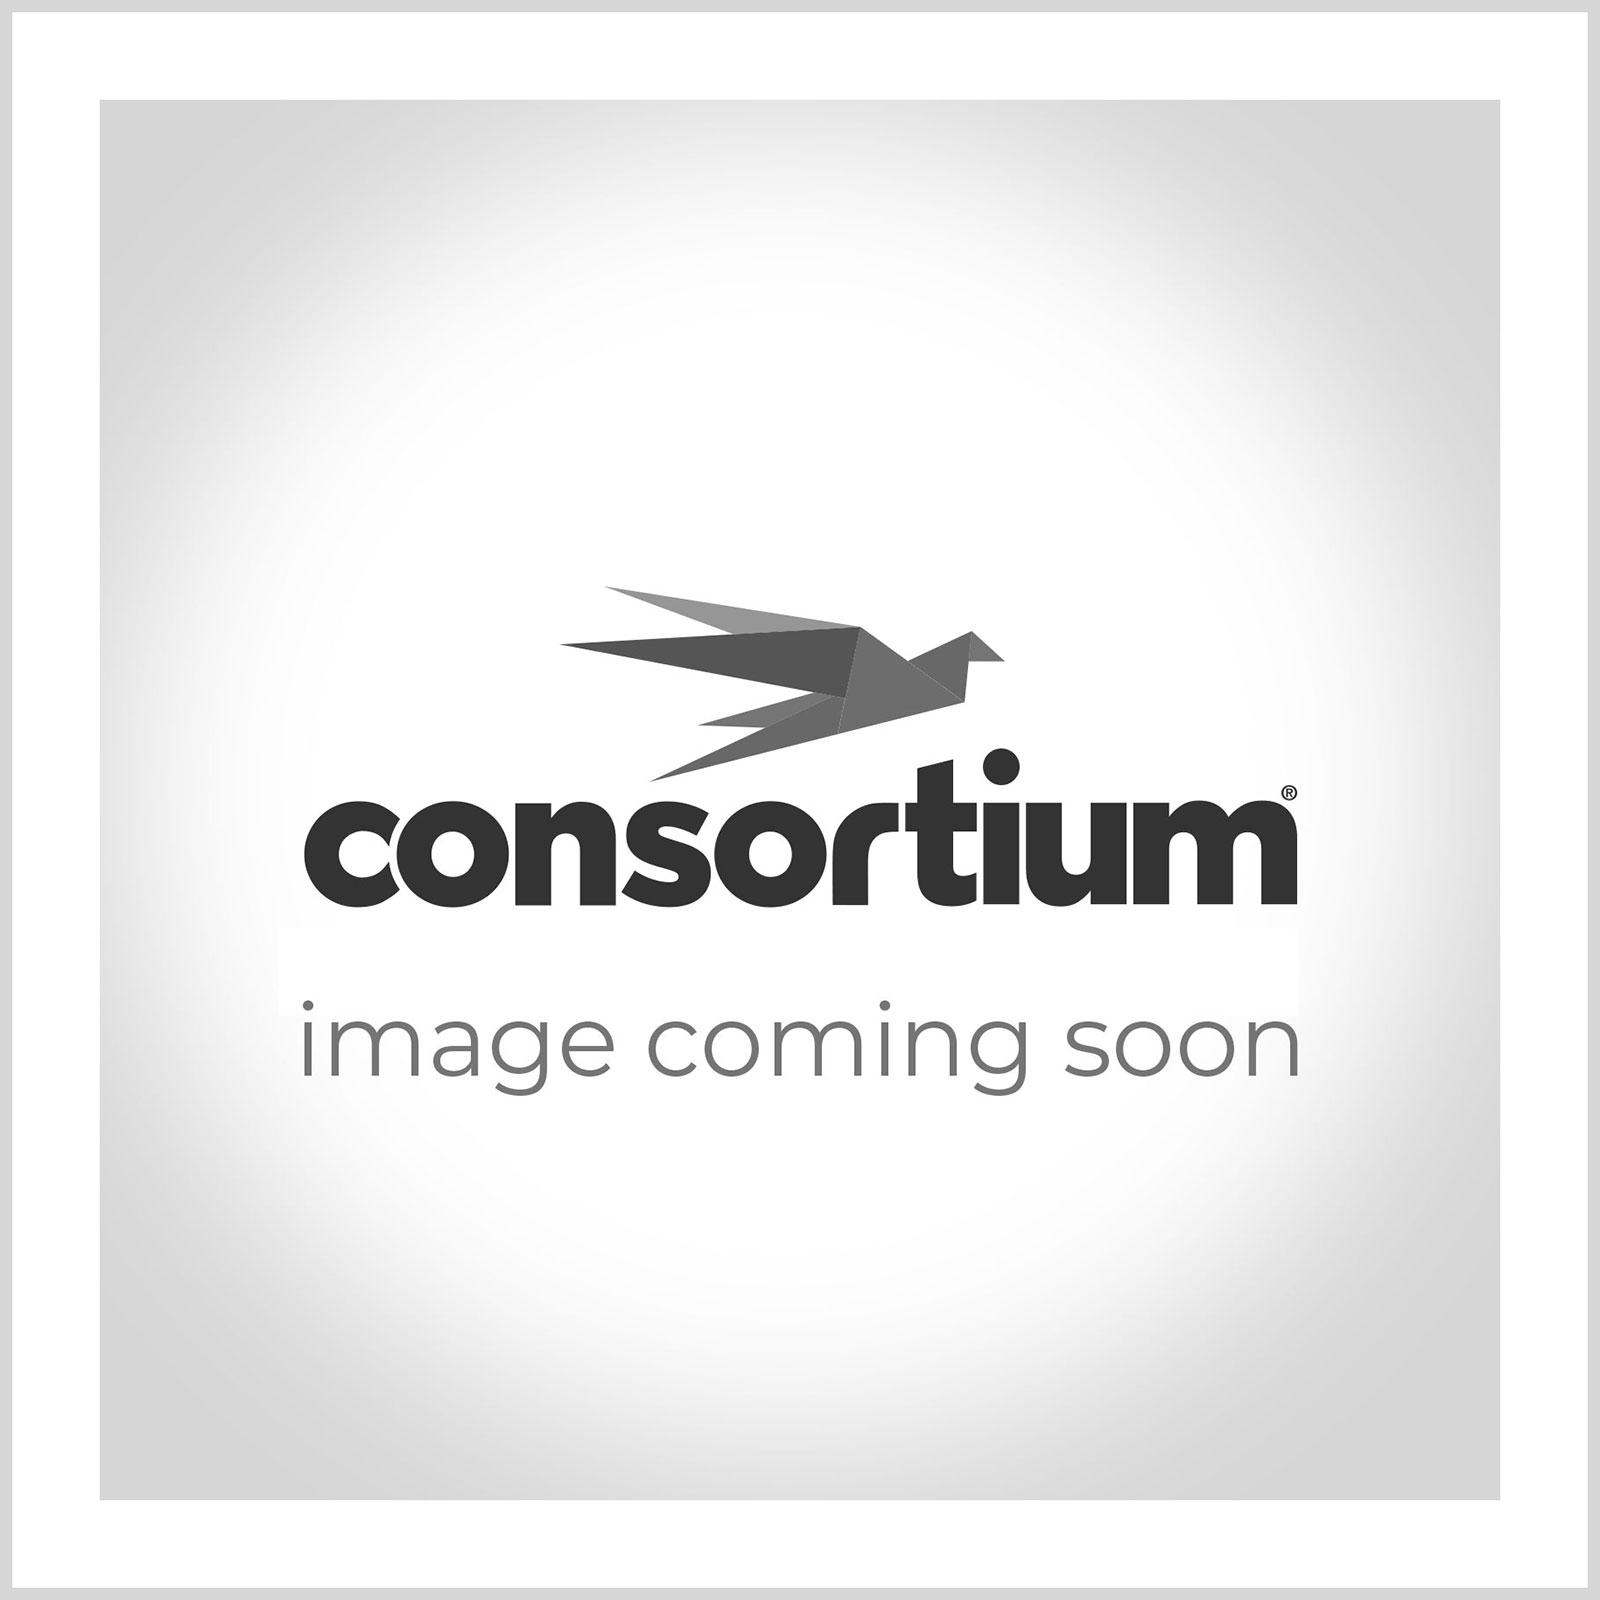 Consortium Project Book